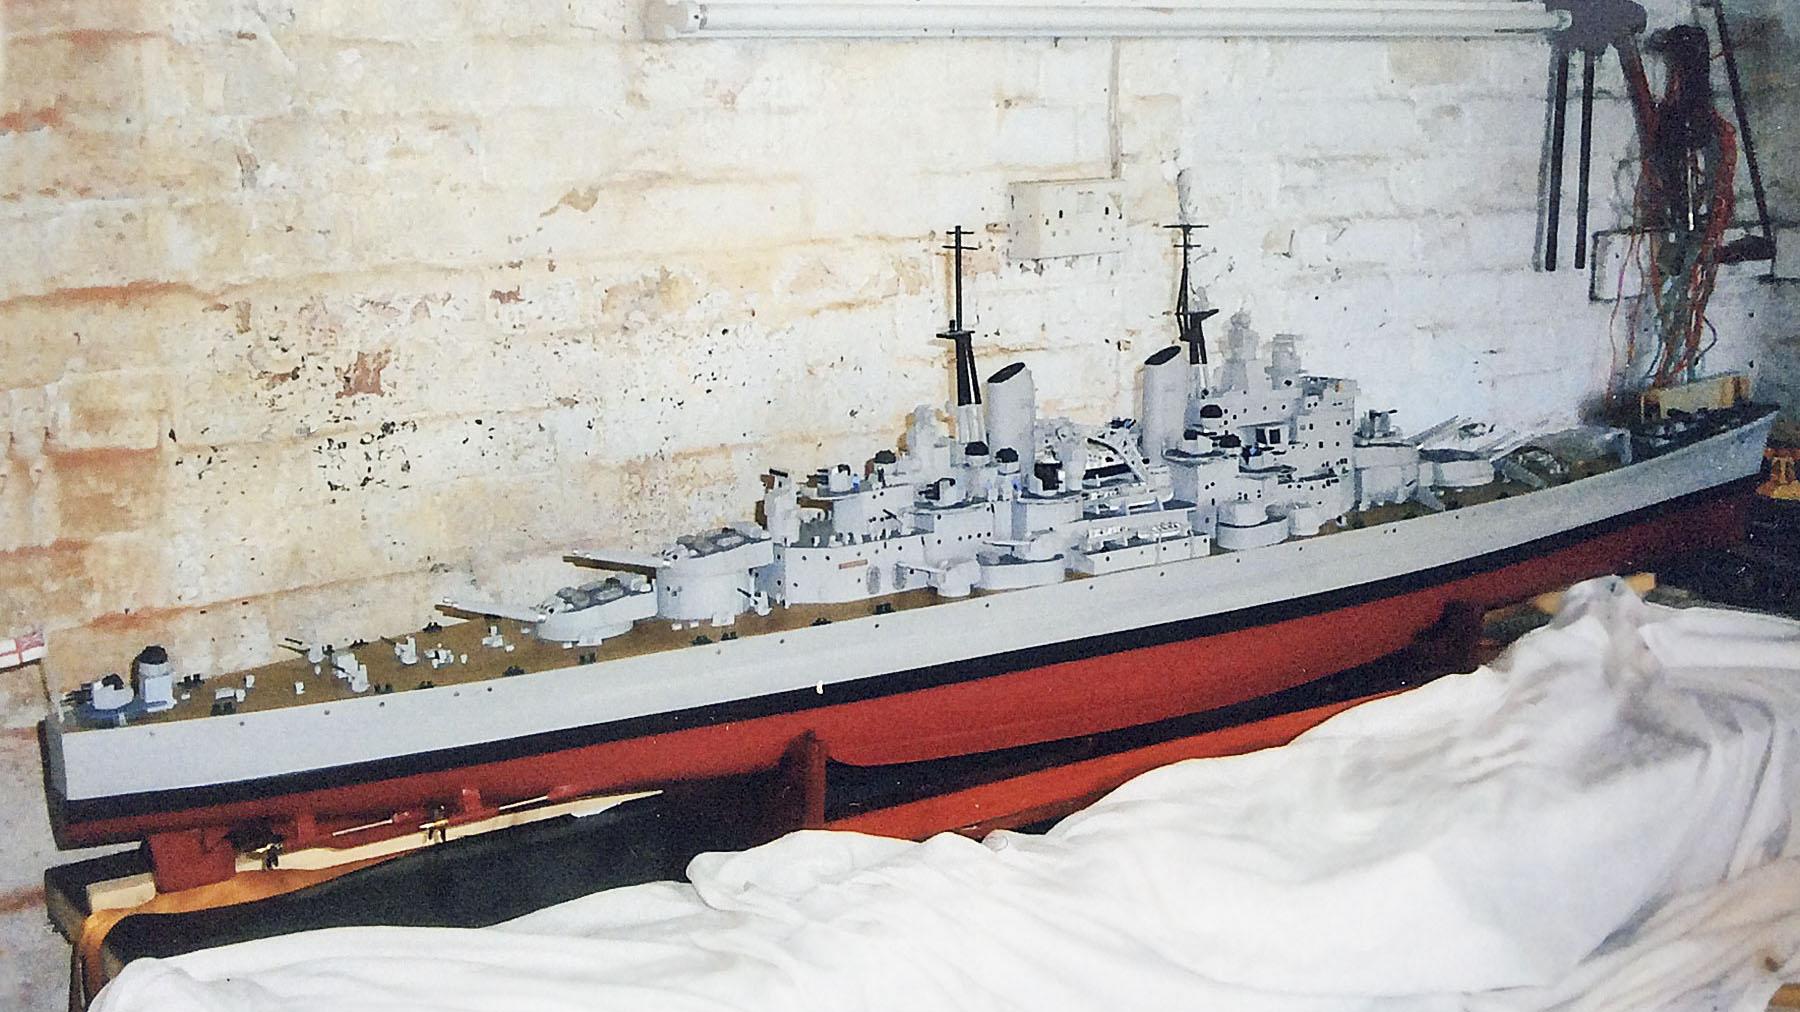 Vanguard 1 16x9